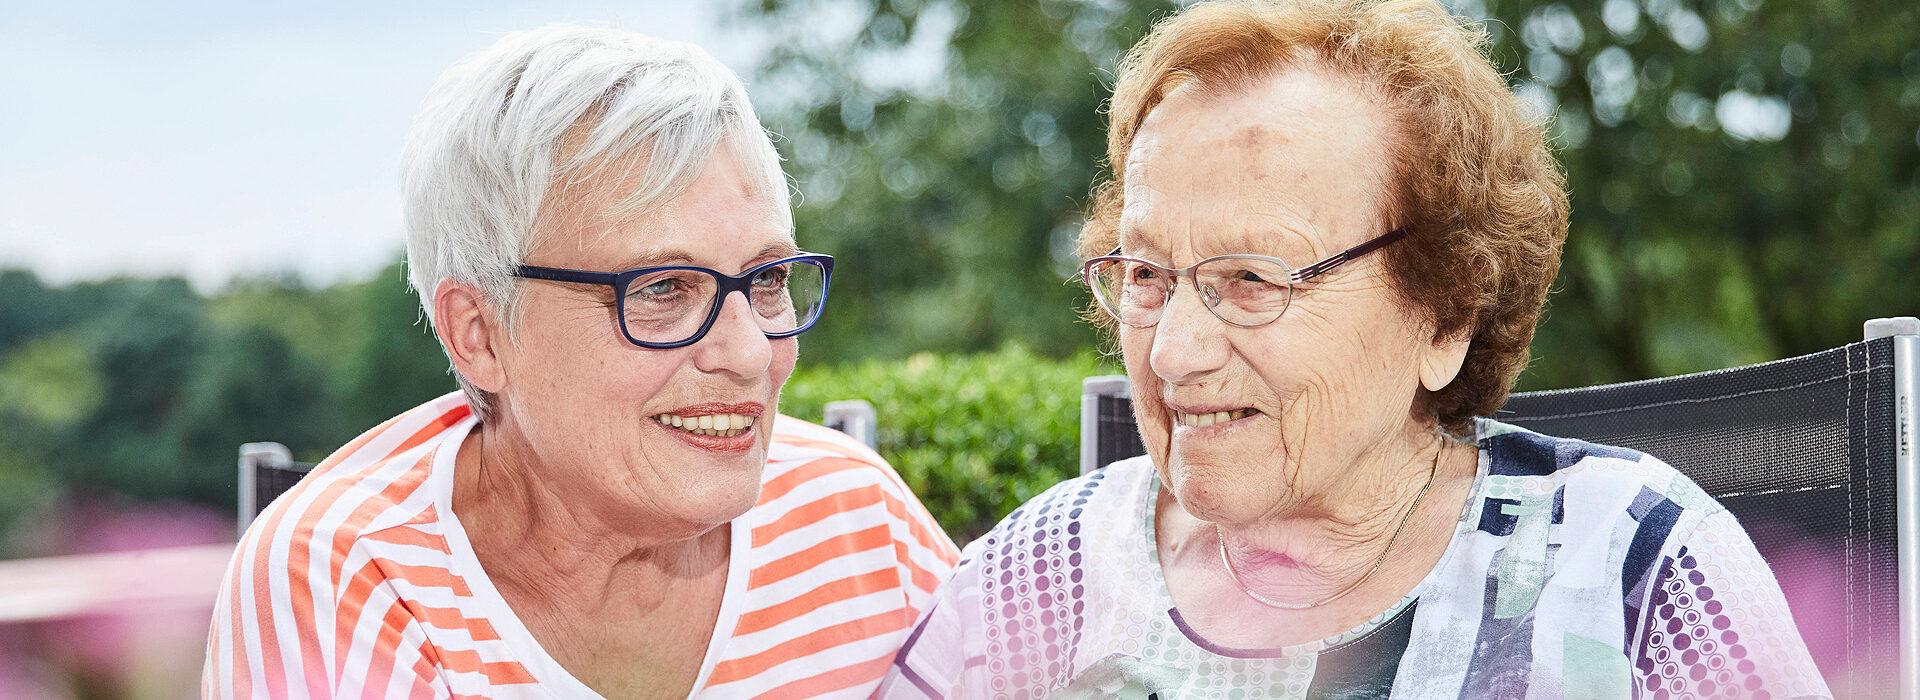 Foto Haus Simeon Münster: Ehrenamtlerin betreut Seniorin im Haus Simeon